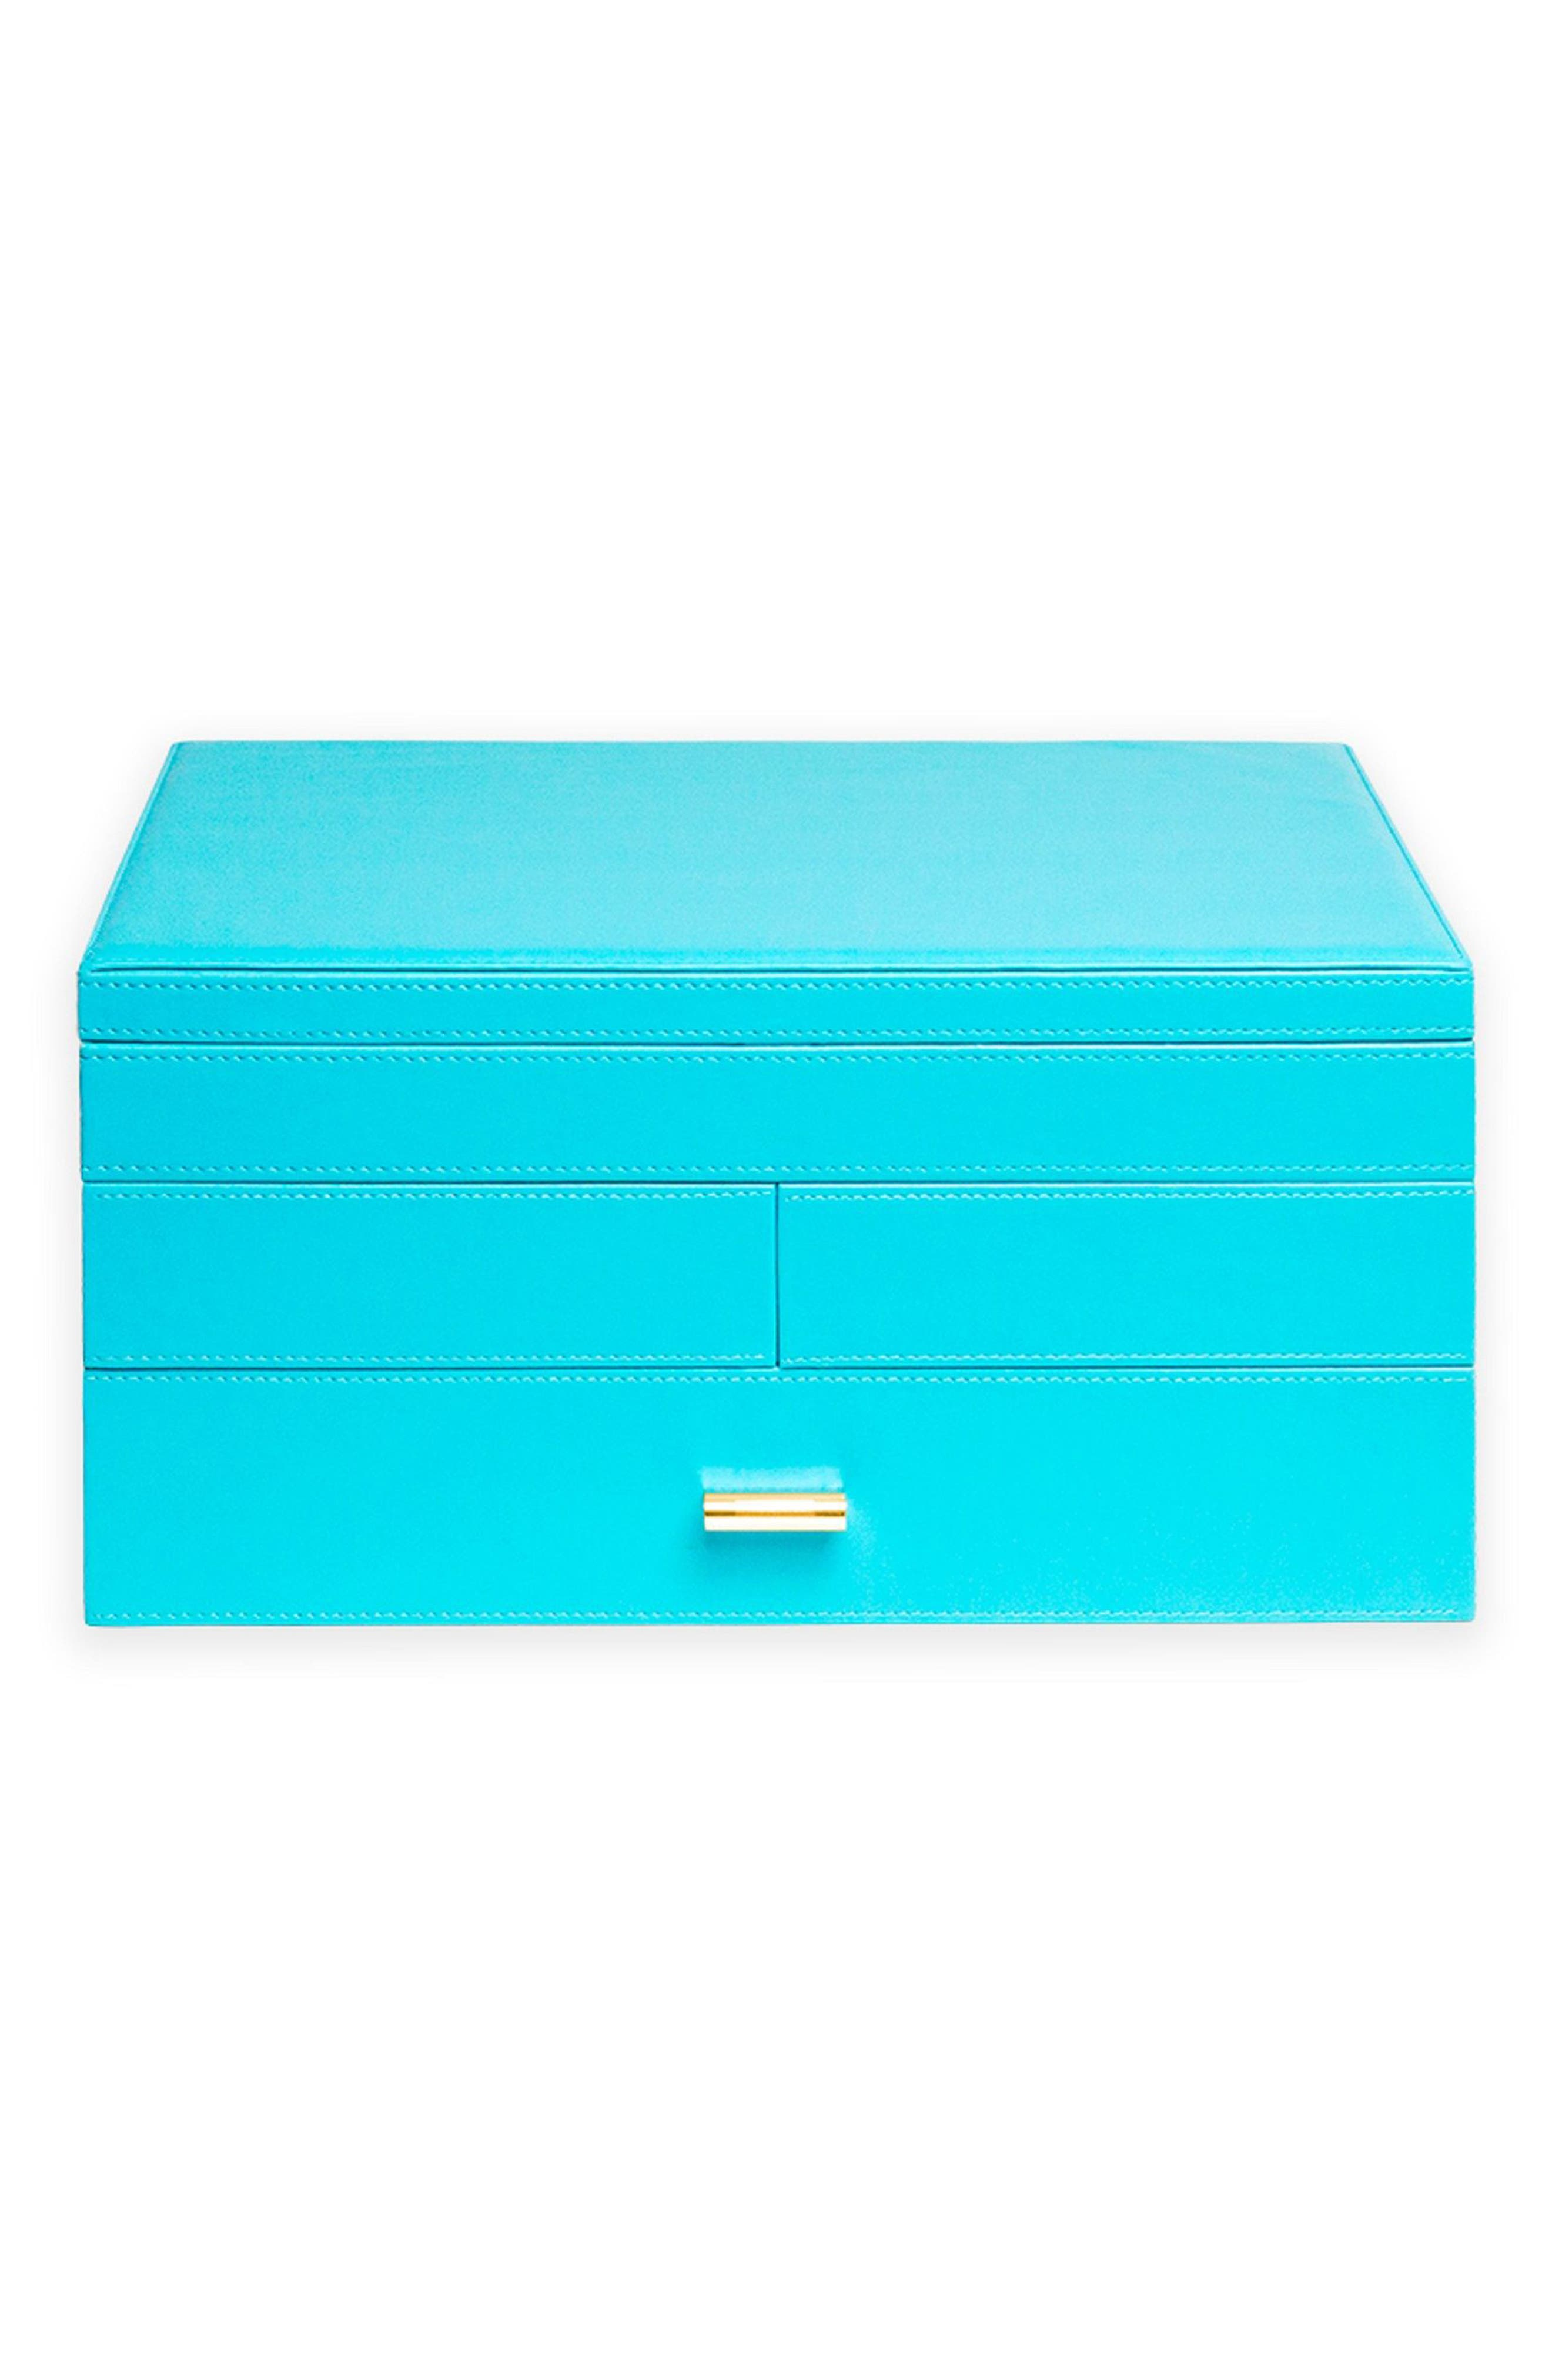 Large Jewelry Box,                             Main thumbnail 1, color,                             TURQUOISE/ CITRON